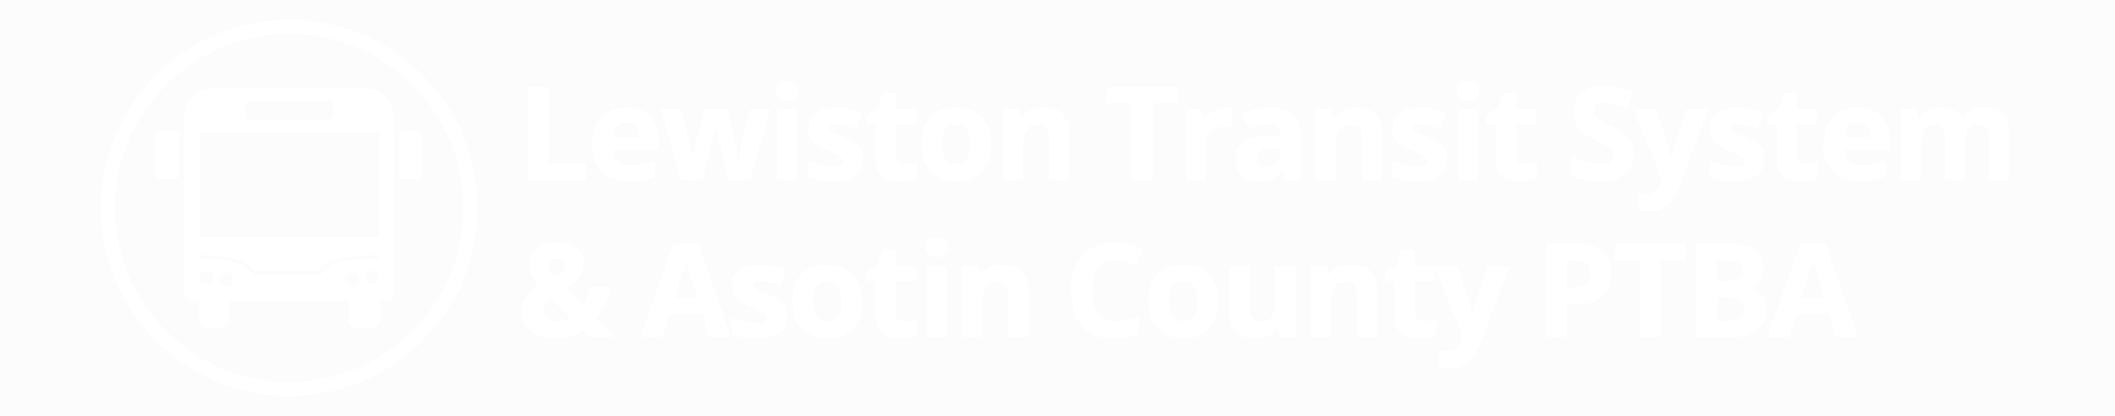 Lewiston Transit System & Asotin County PTBA